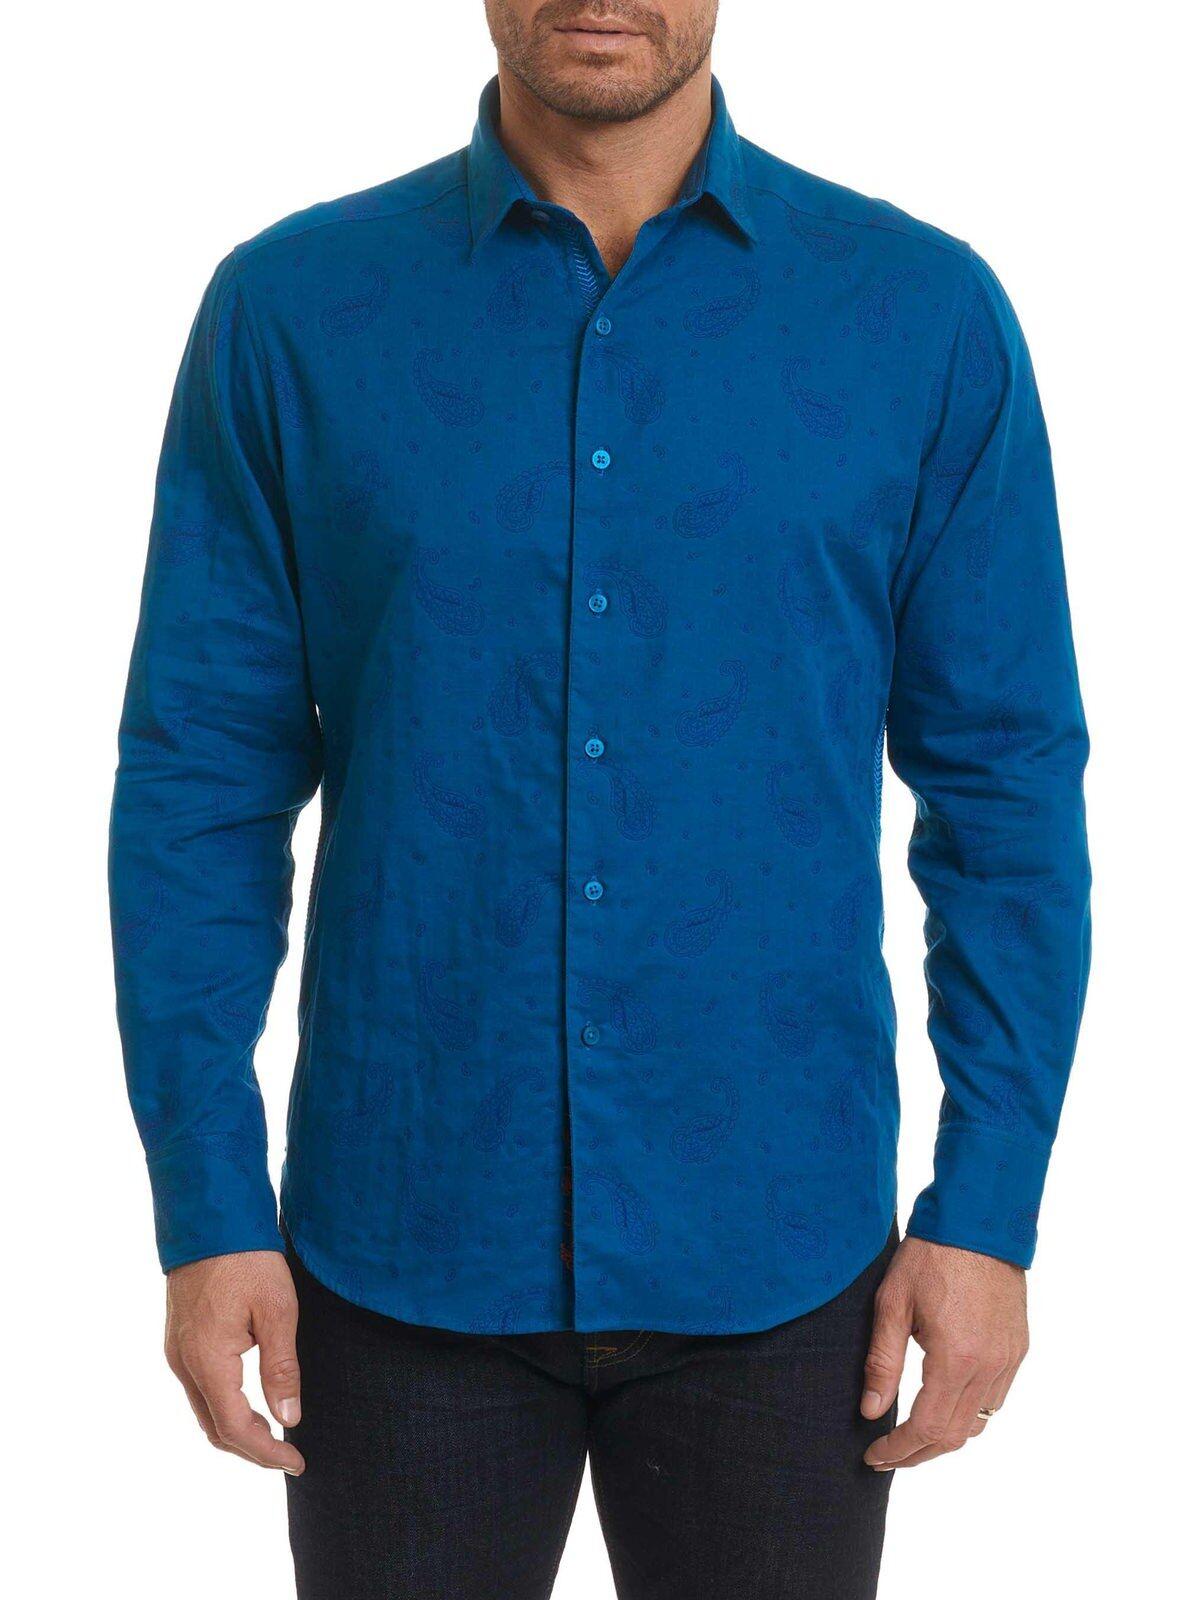 New Robert Graham Wayfarer Sport Shirt Classic Fit Größe Medium Blau Paisley